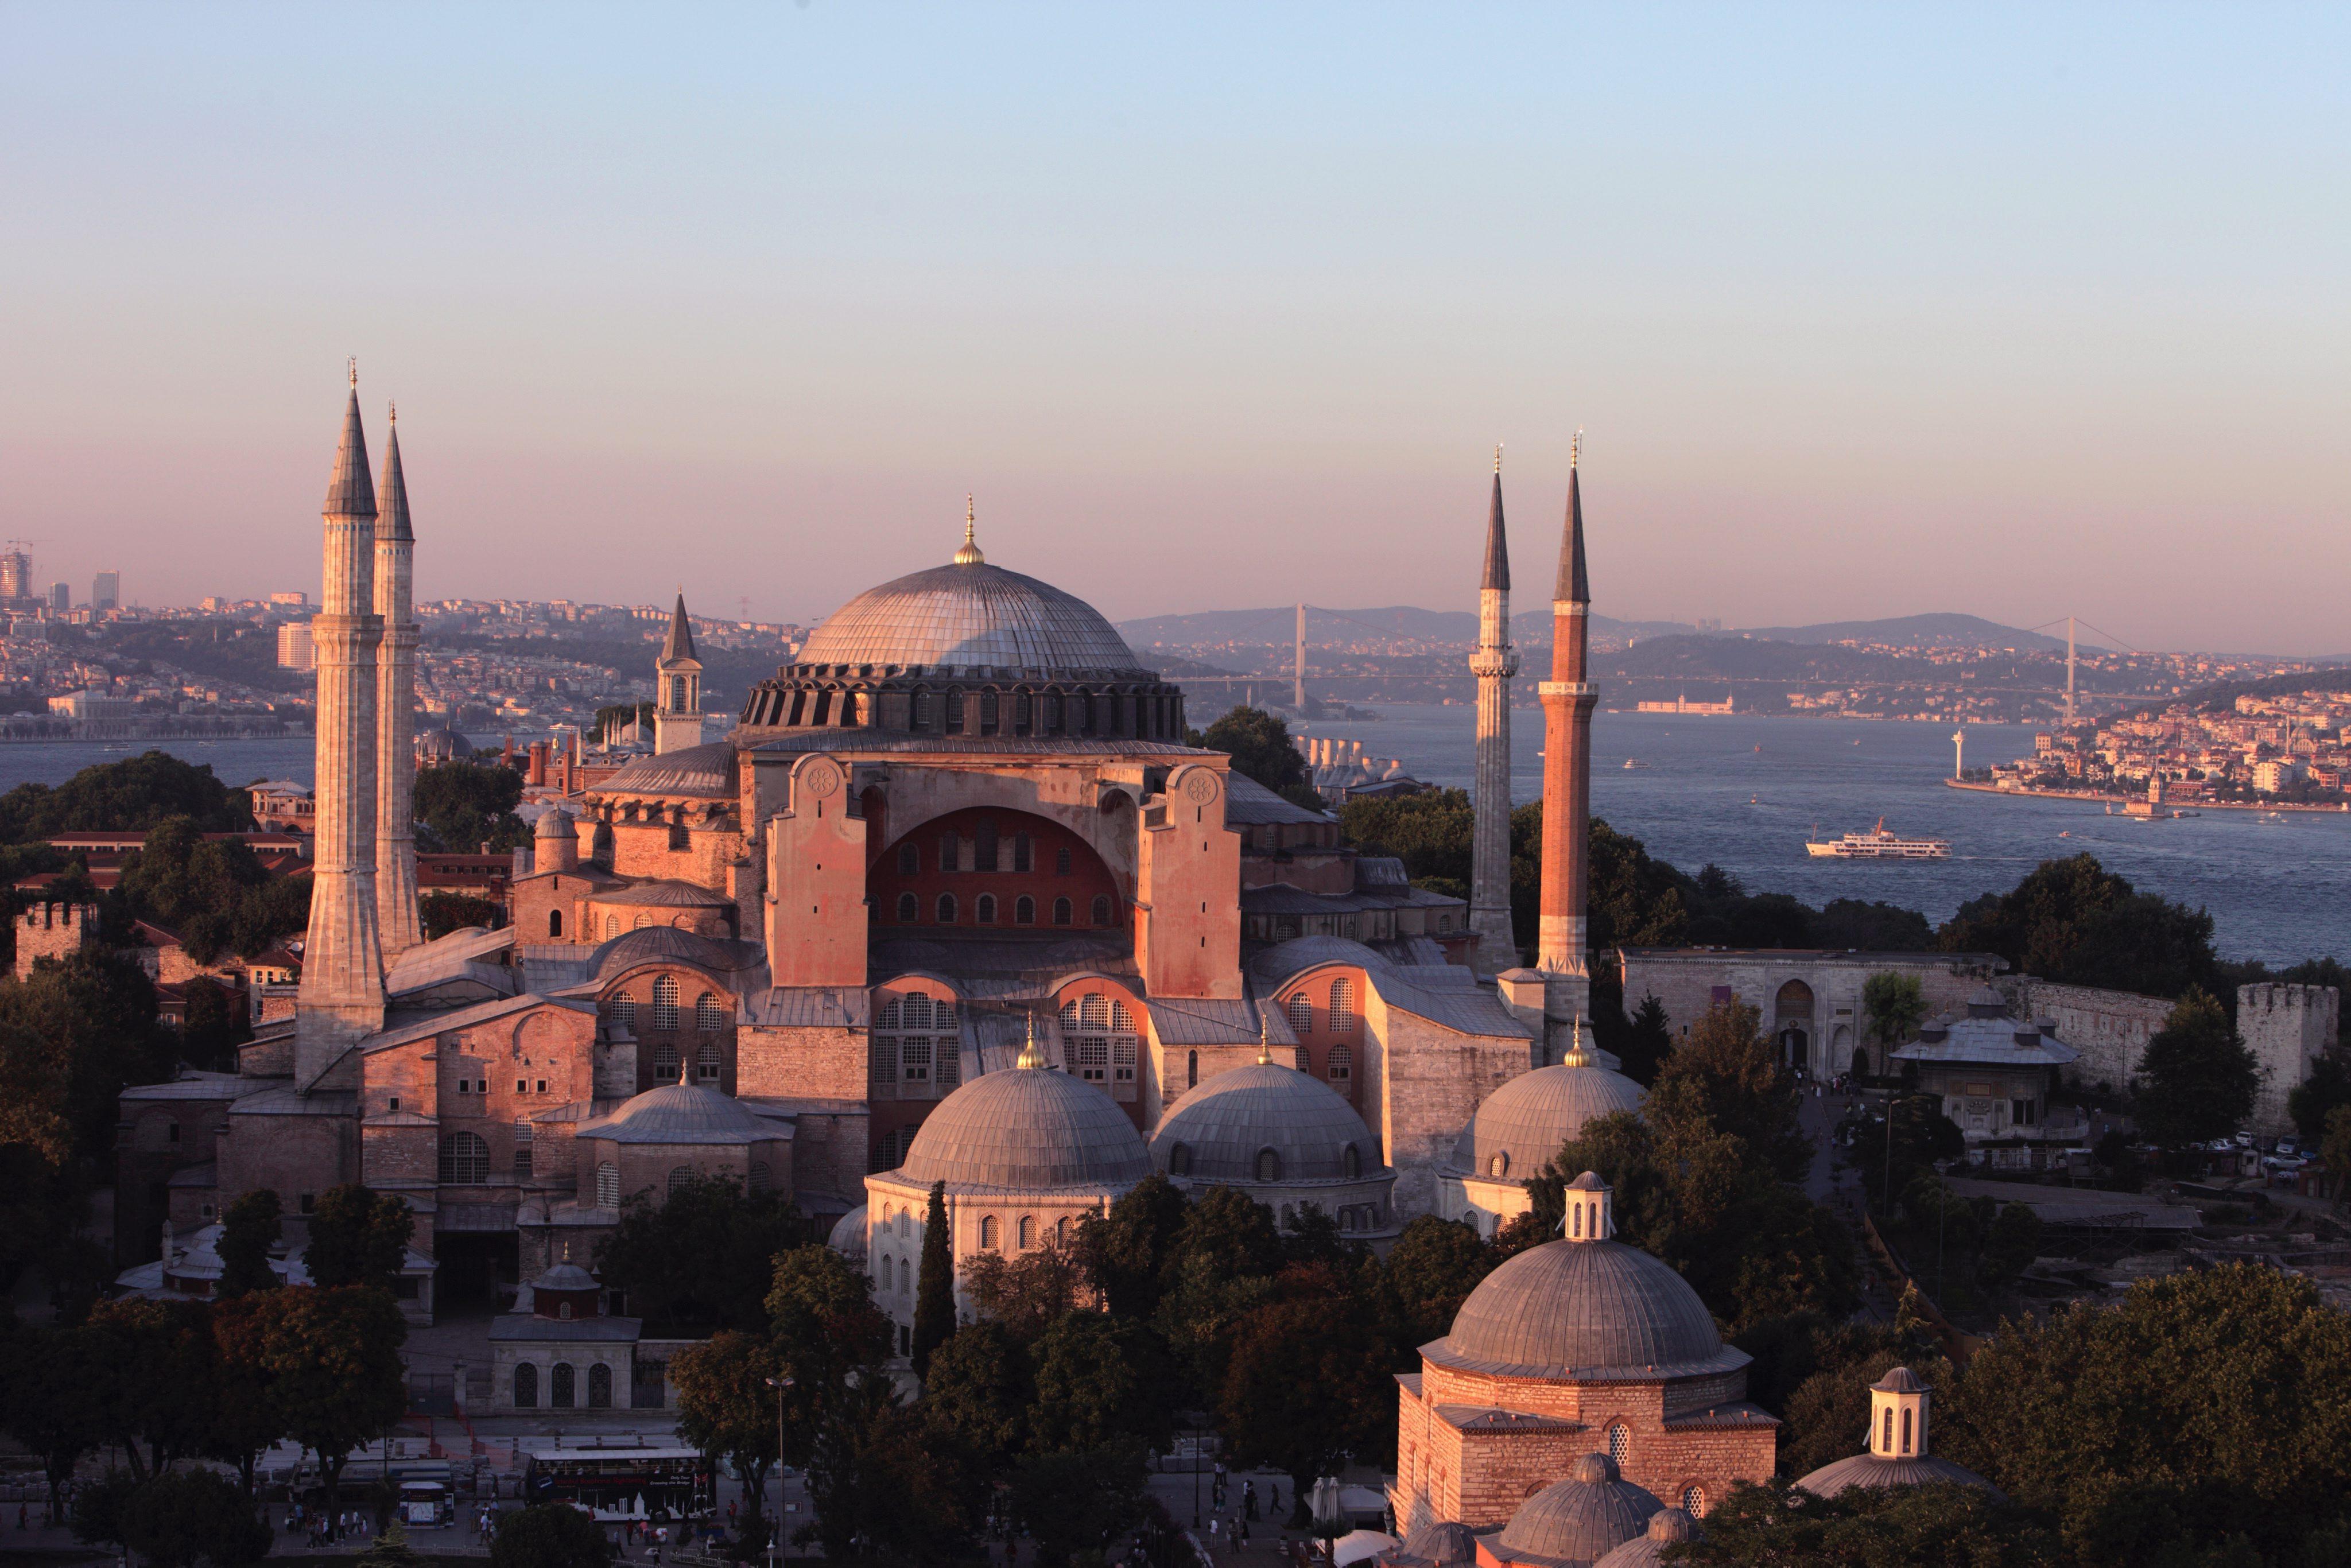 UNESCO warns Turkey: Converting Hagia Sophia into mosque is illegal